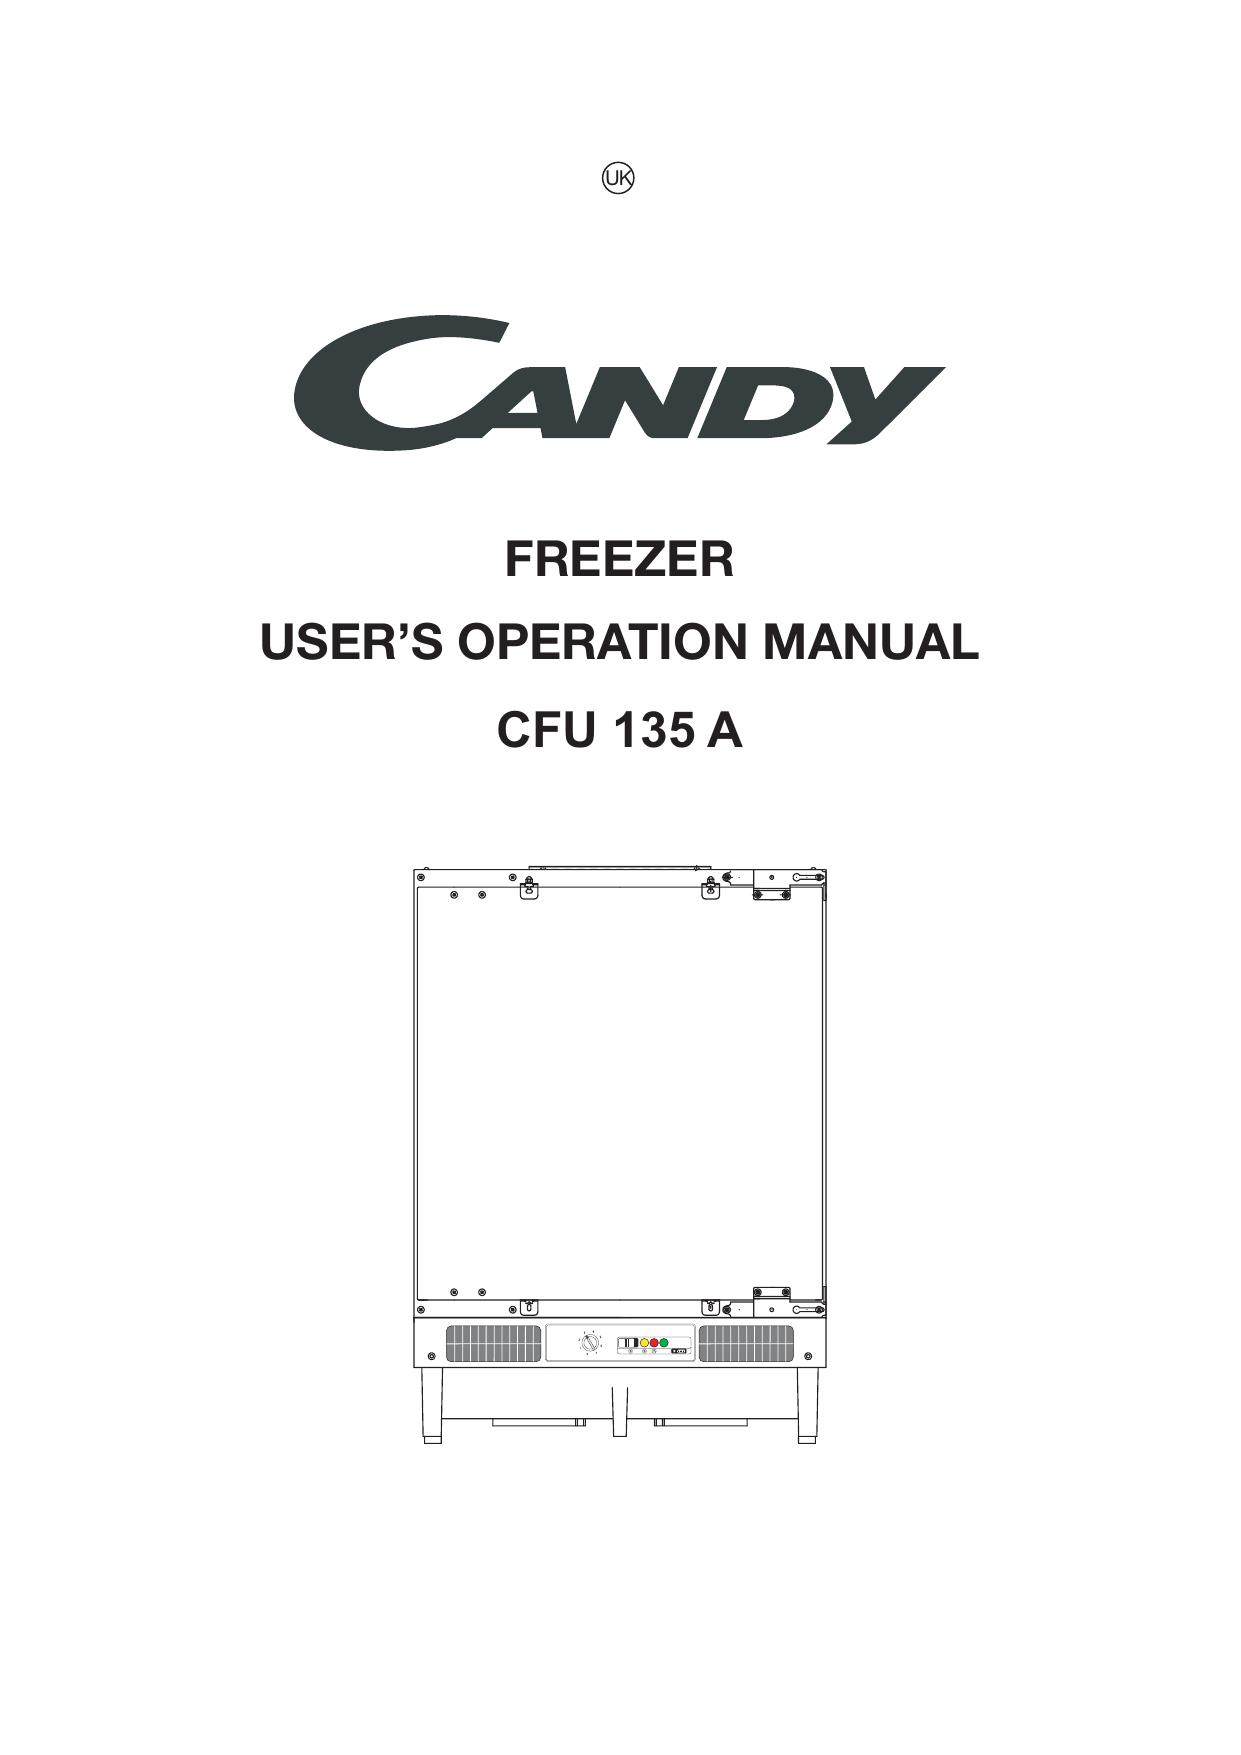 Cfu 135 A Freezer User S Operation Manual